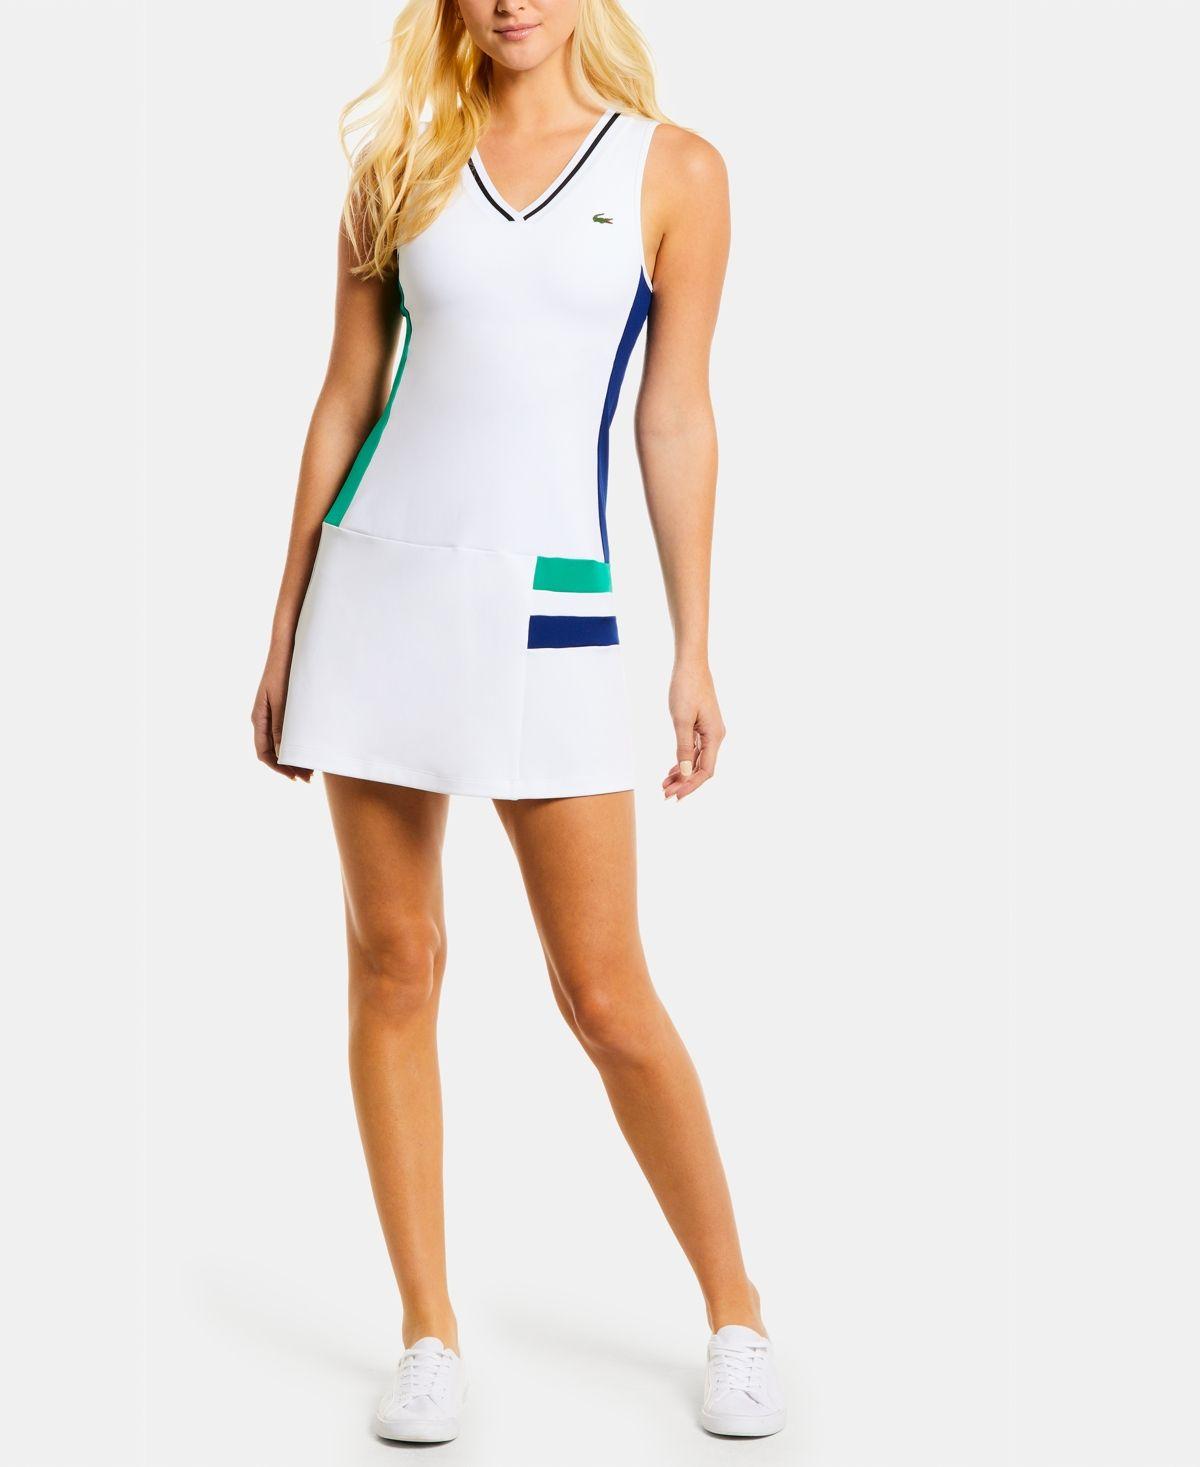 Lacoste Colorblocked Sleeveless Tennis Dress White White Black Greenfi In 2021 Tennis Dress Lacoste Tennis Dress Tennis Clothes [ 1467 x 1200 Pixel ]